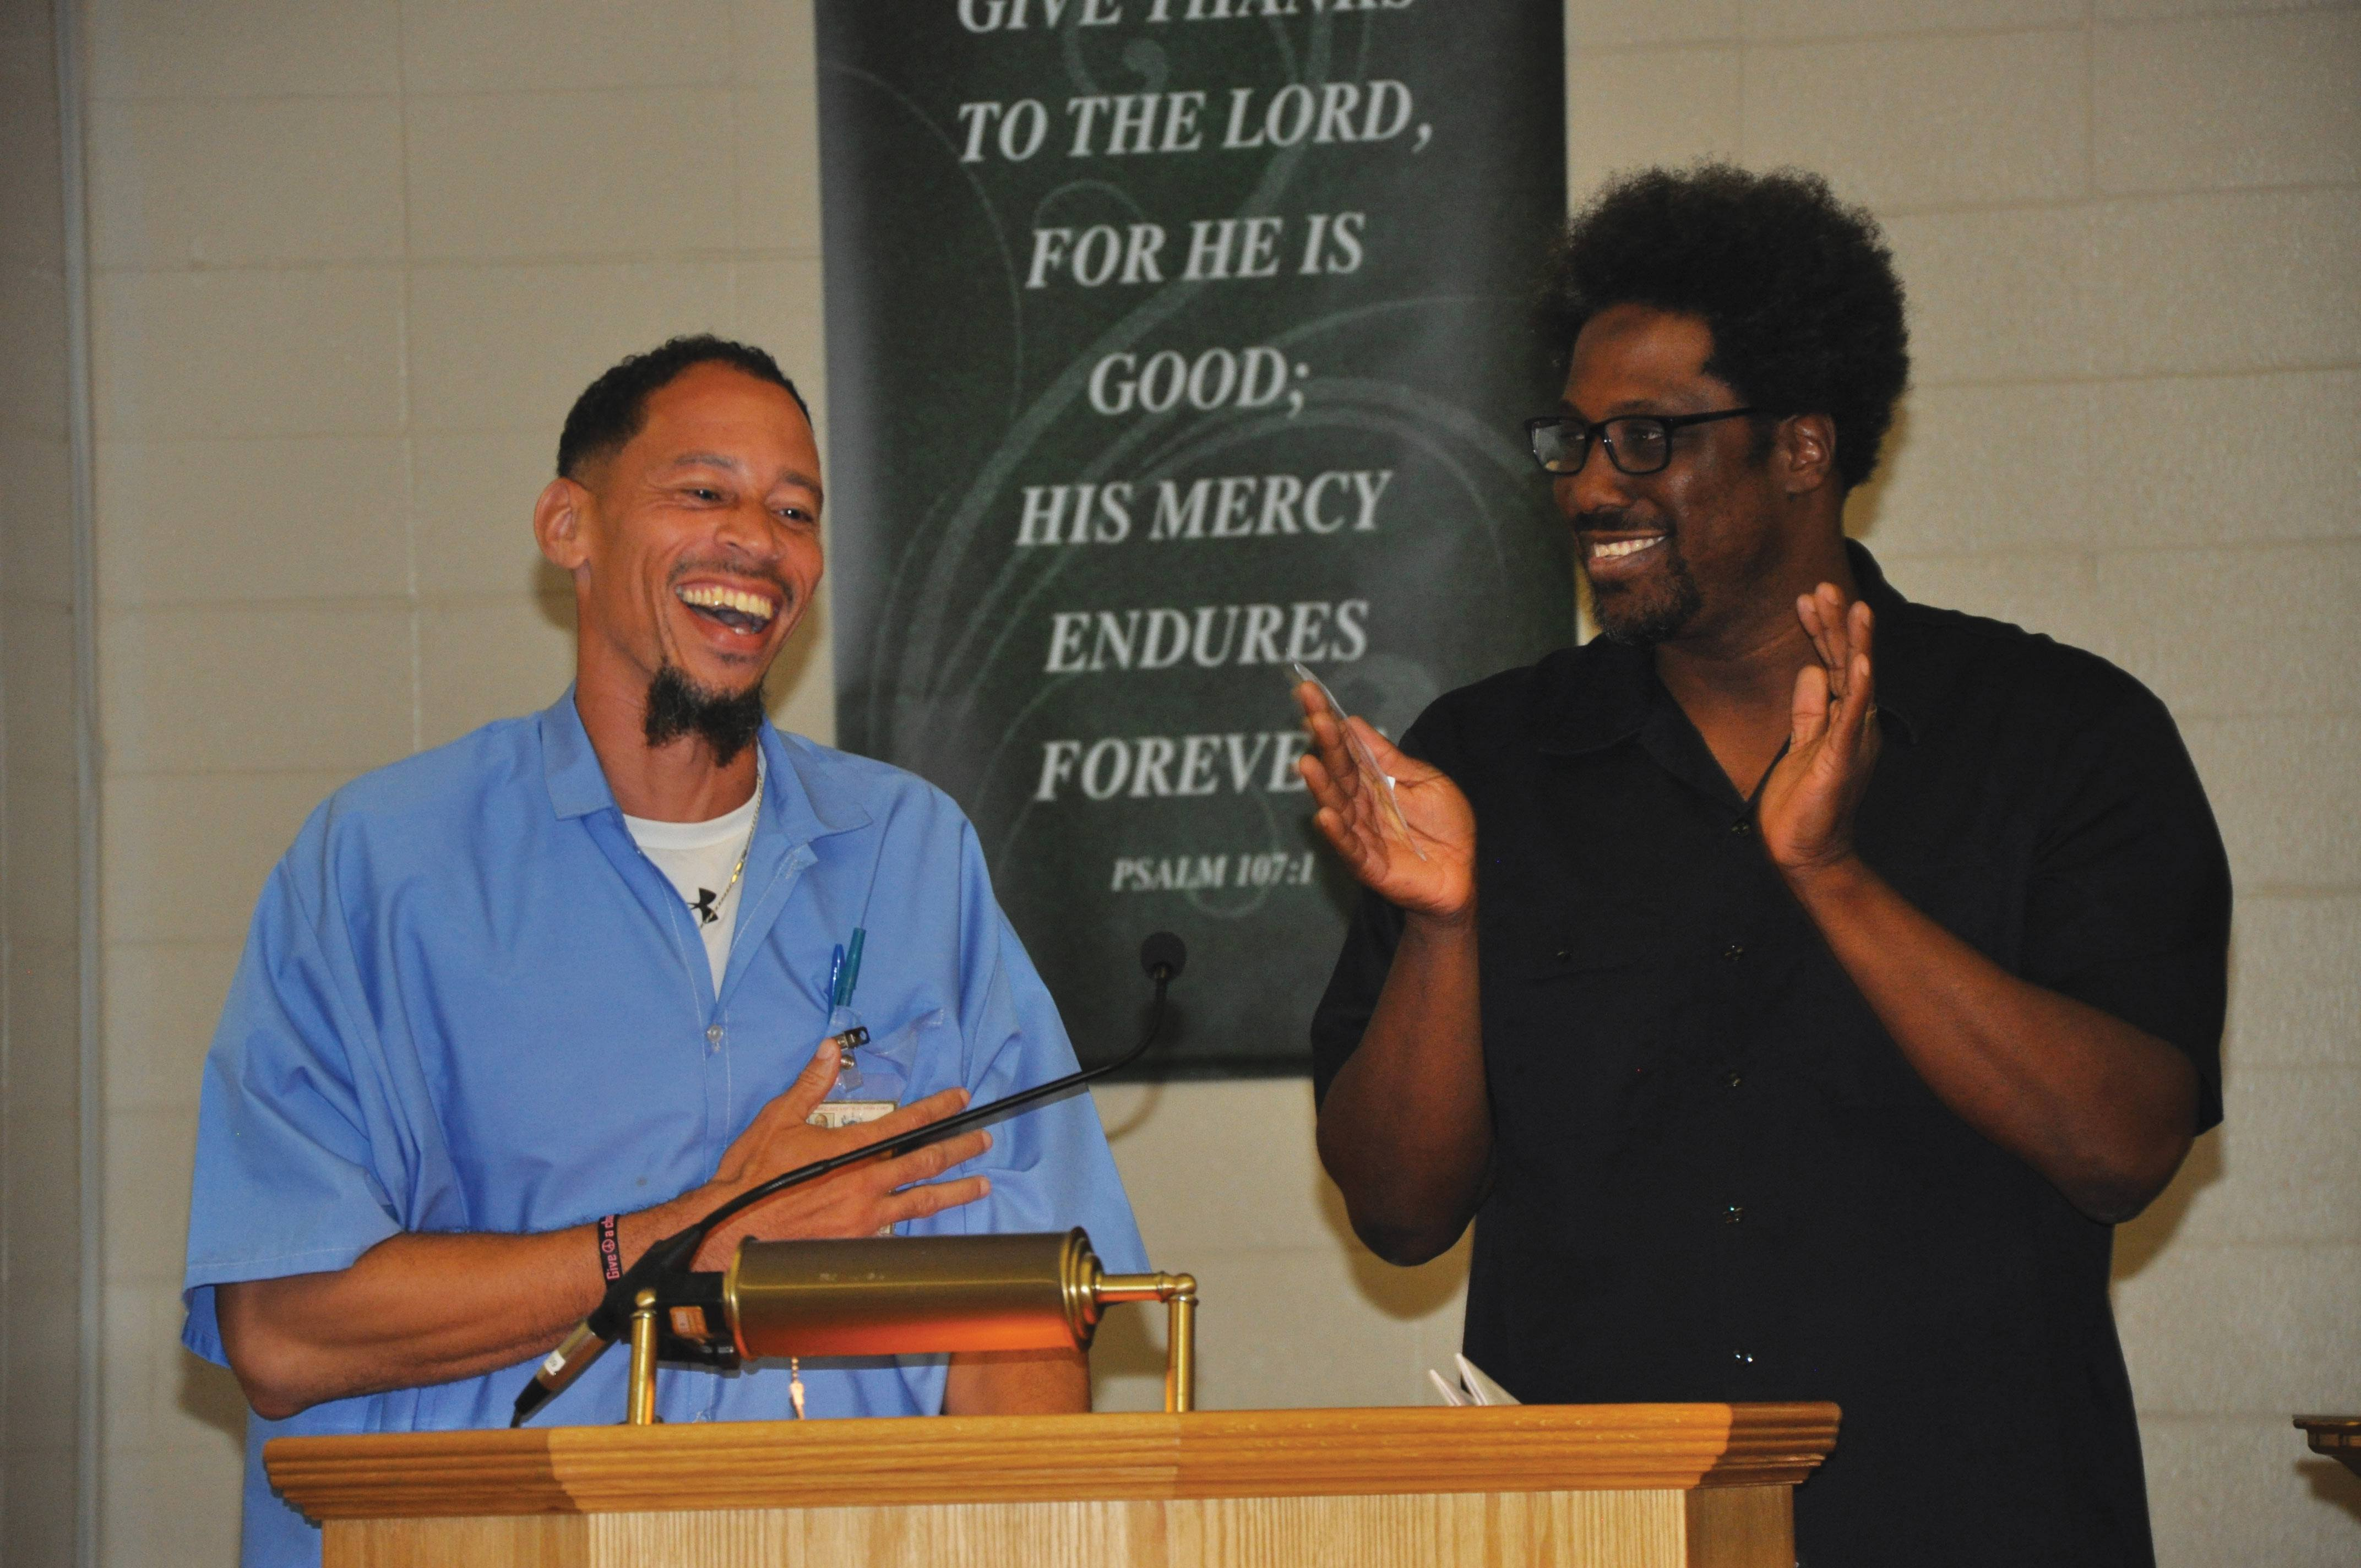 Hosts Rahsaan Thomas and W. Kamau Bell